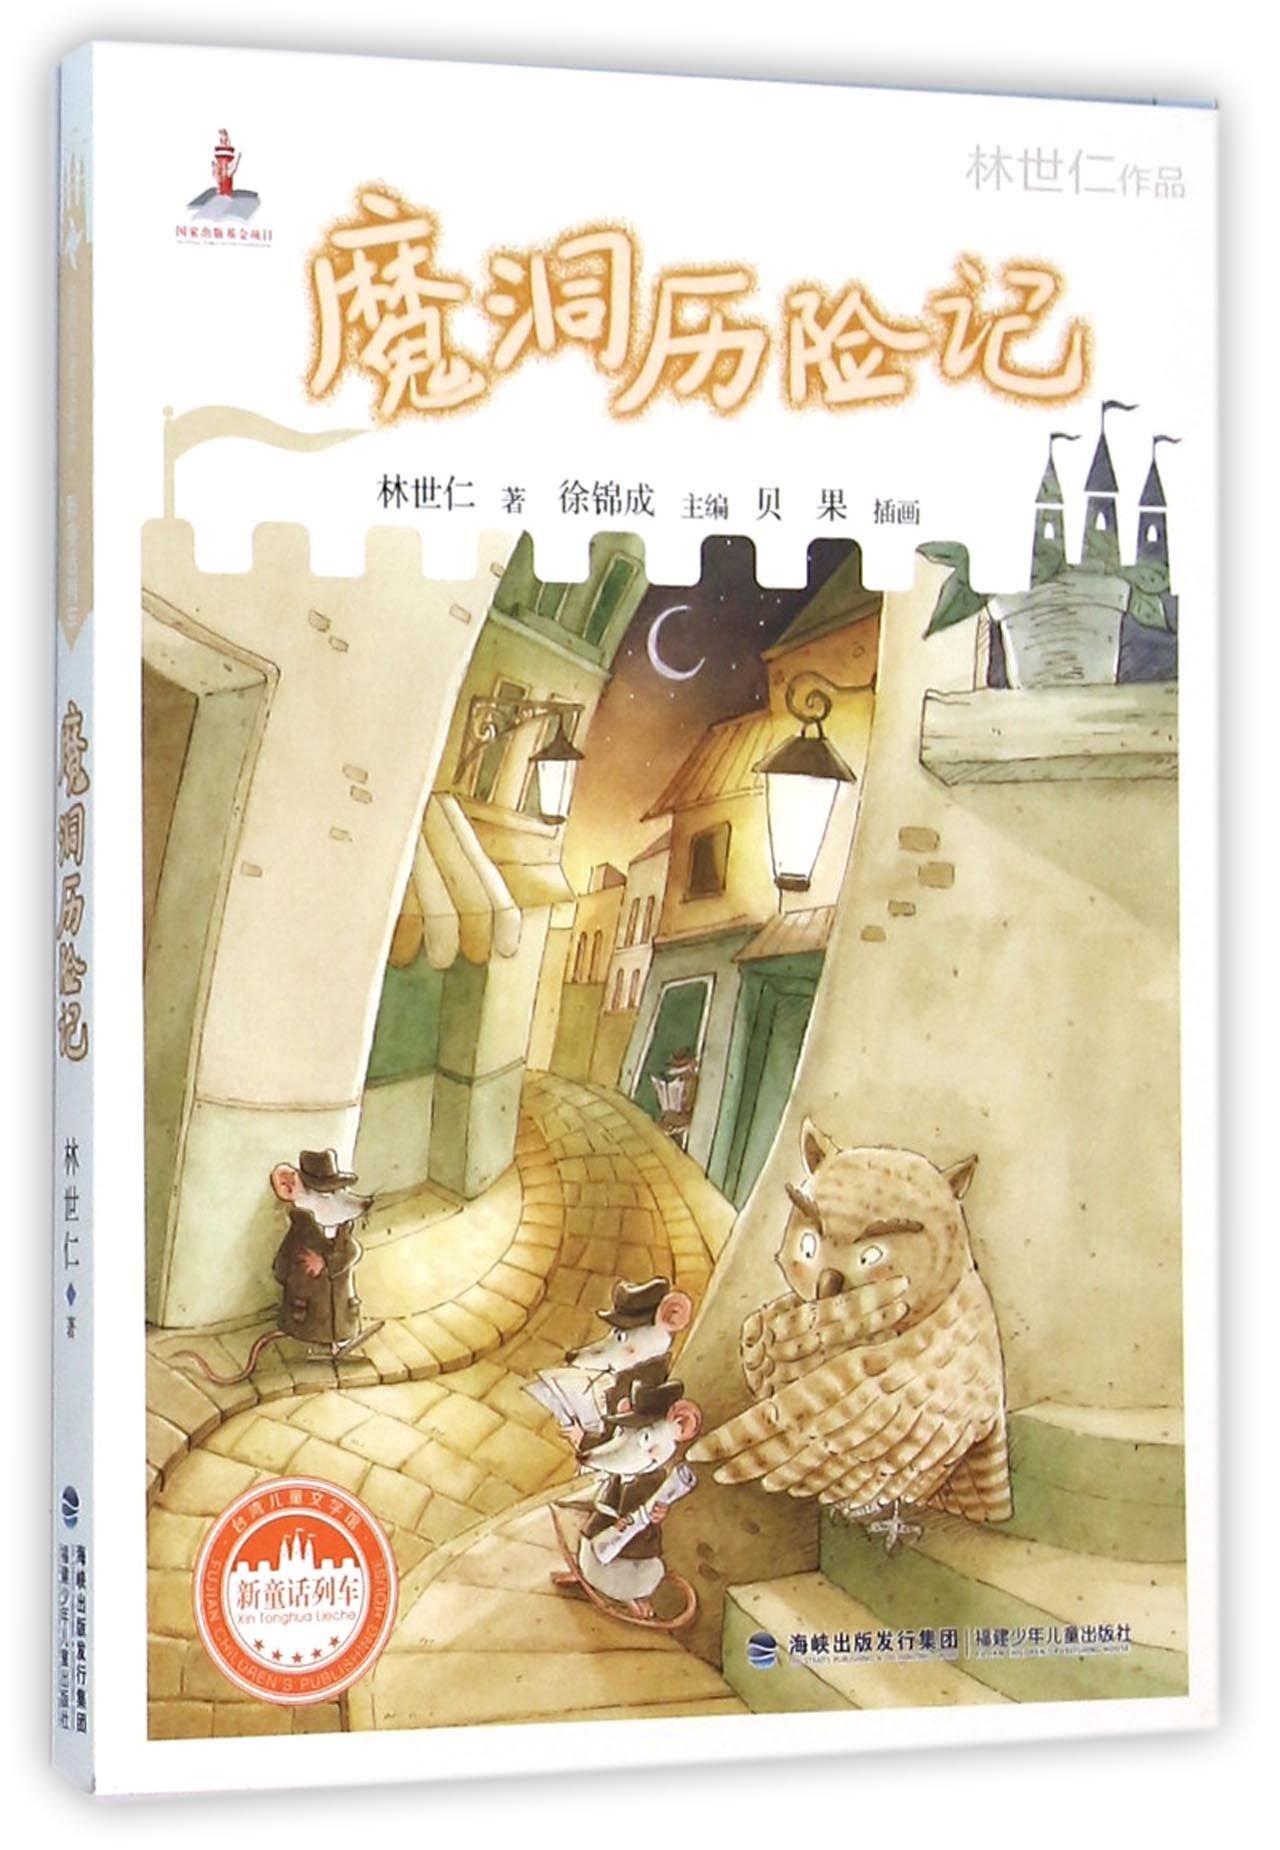 Adventure in the Magic Hole (Chinese Edition) ePub fb2 ebook